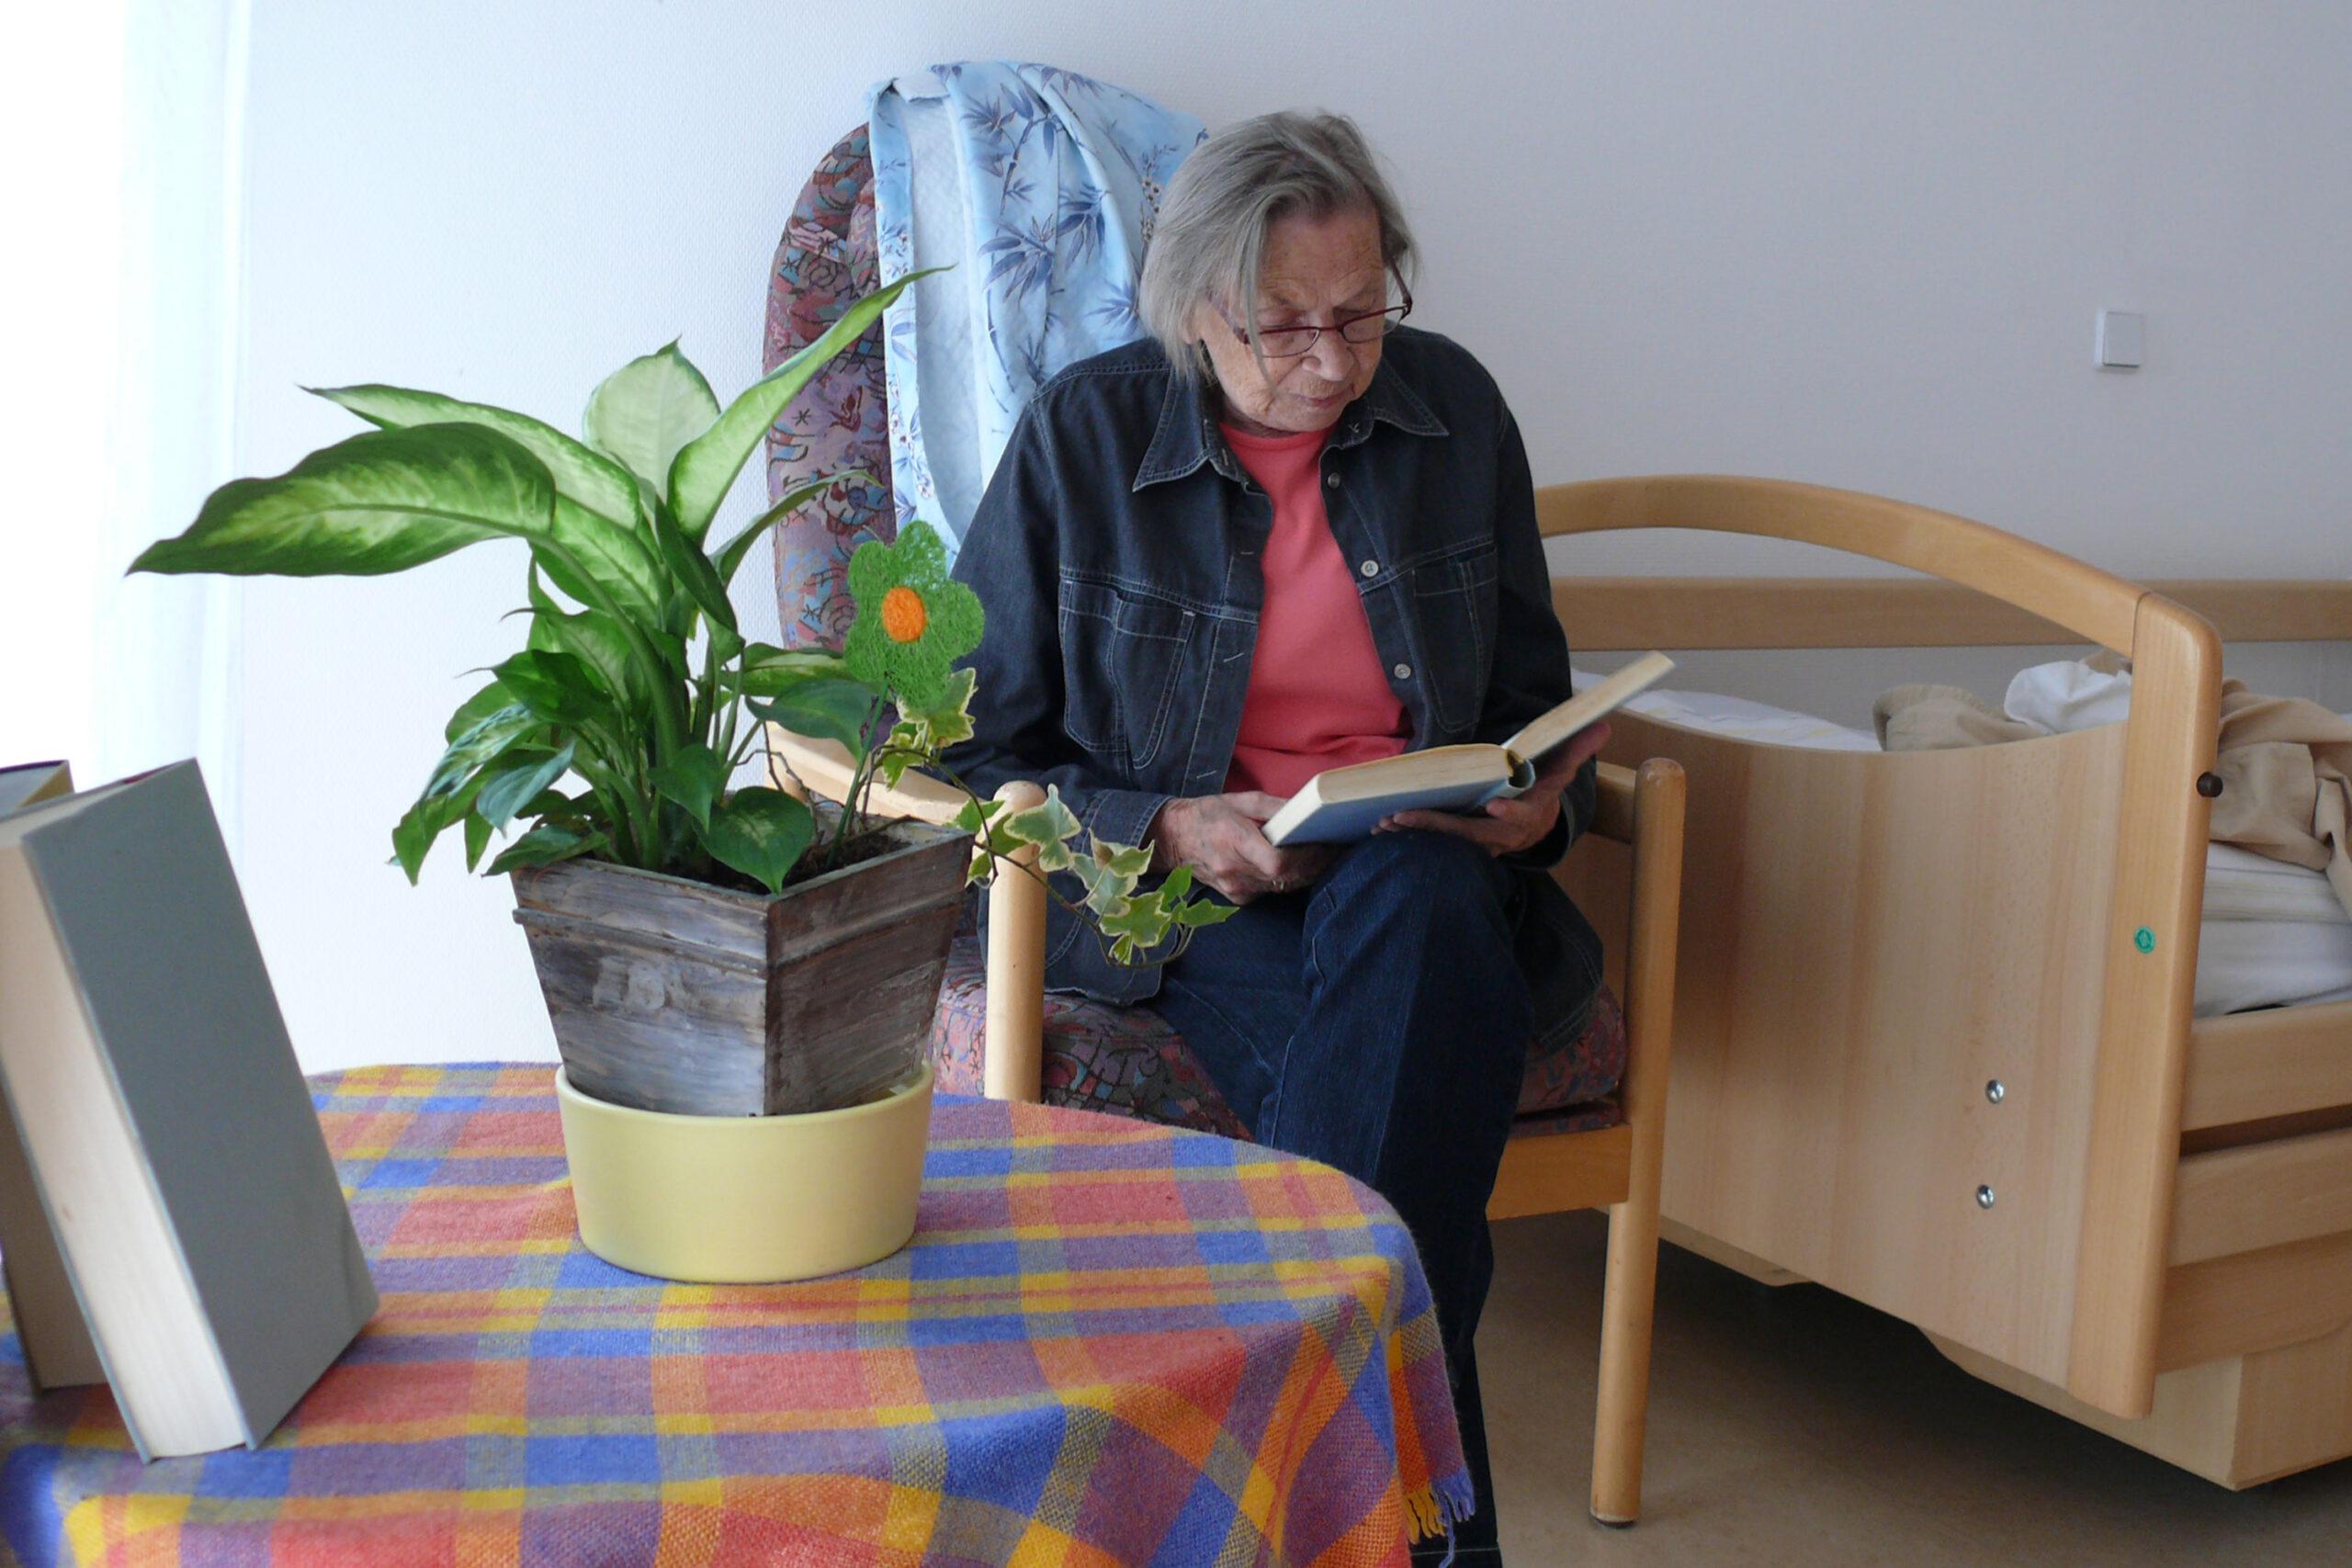 Senorin am Lesen im Zimmer